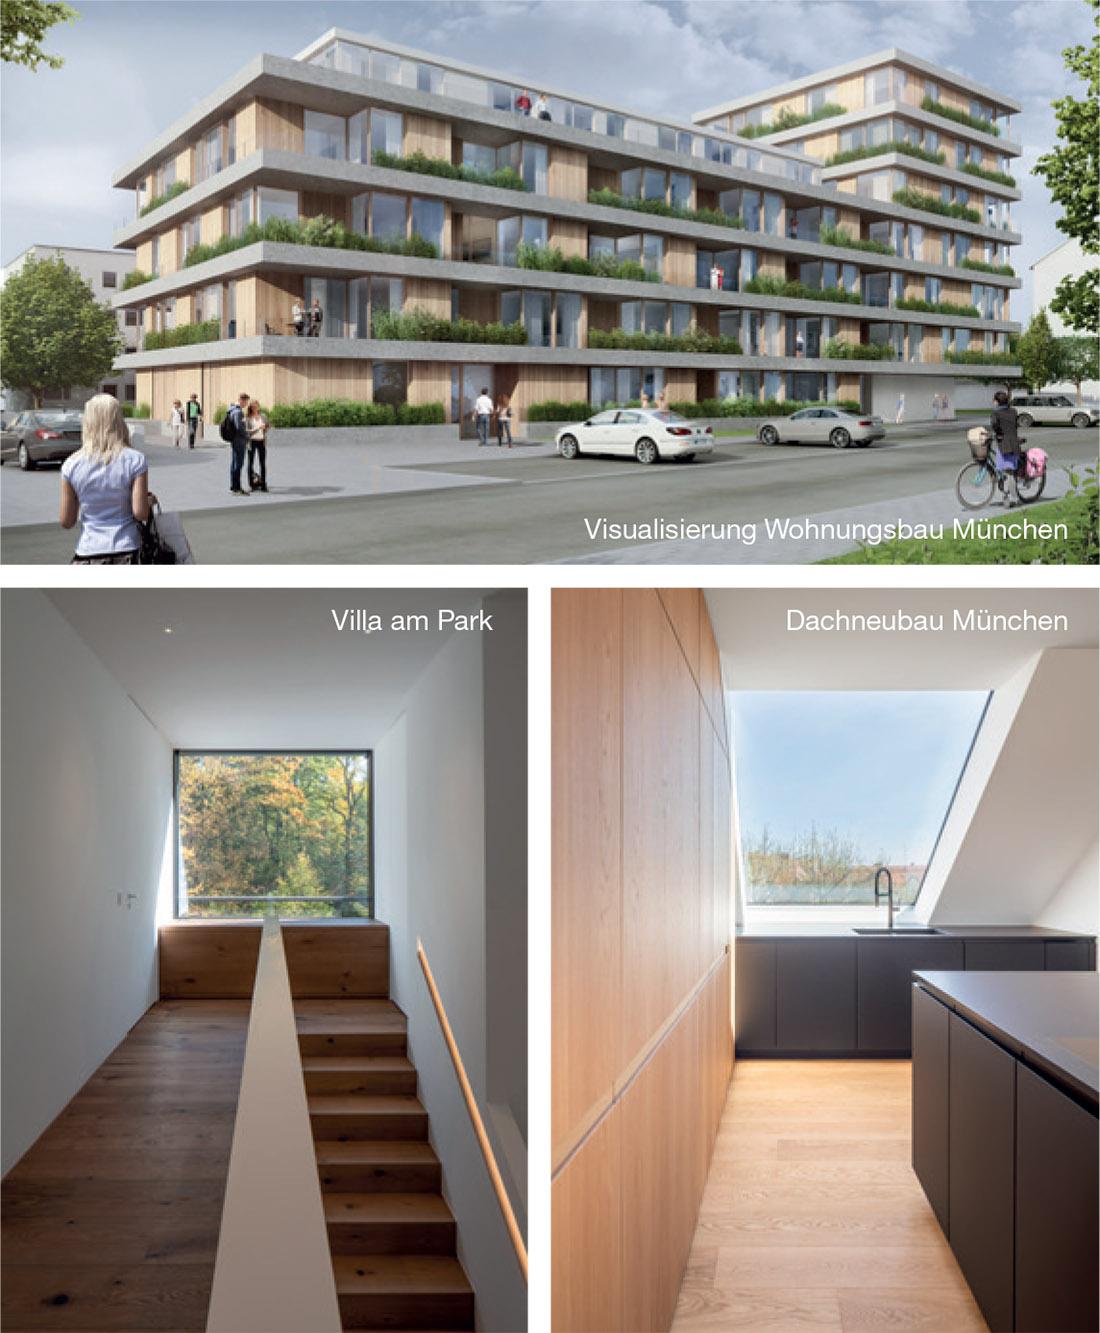 Unterlandstättner Architekten: PEOPLE ARE THE MEASUREMENT FOR SUSTAINABLE ARCHITECTURE